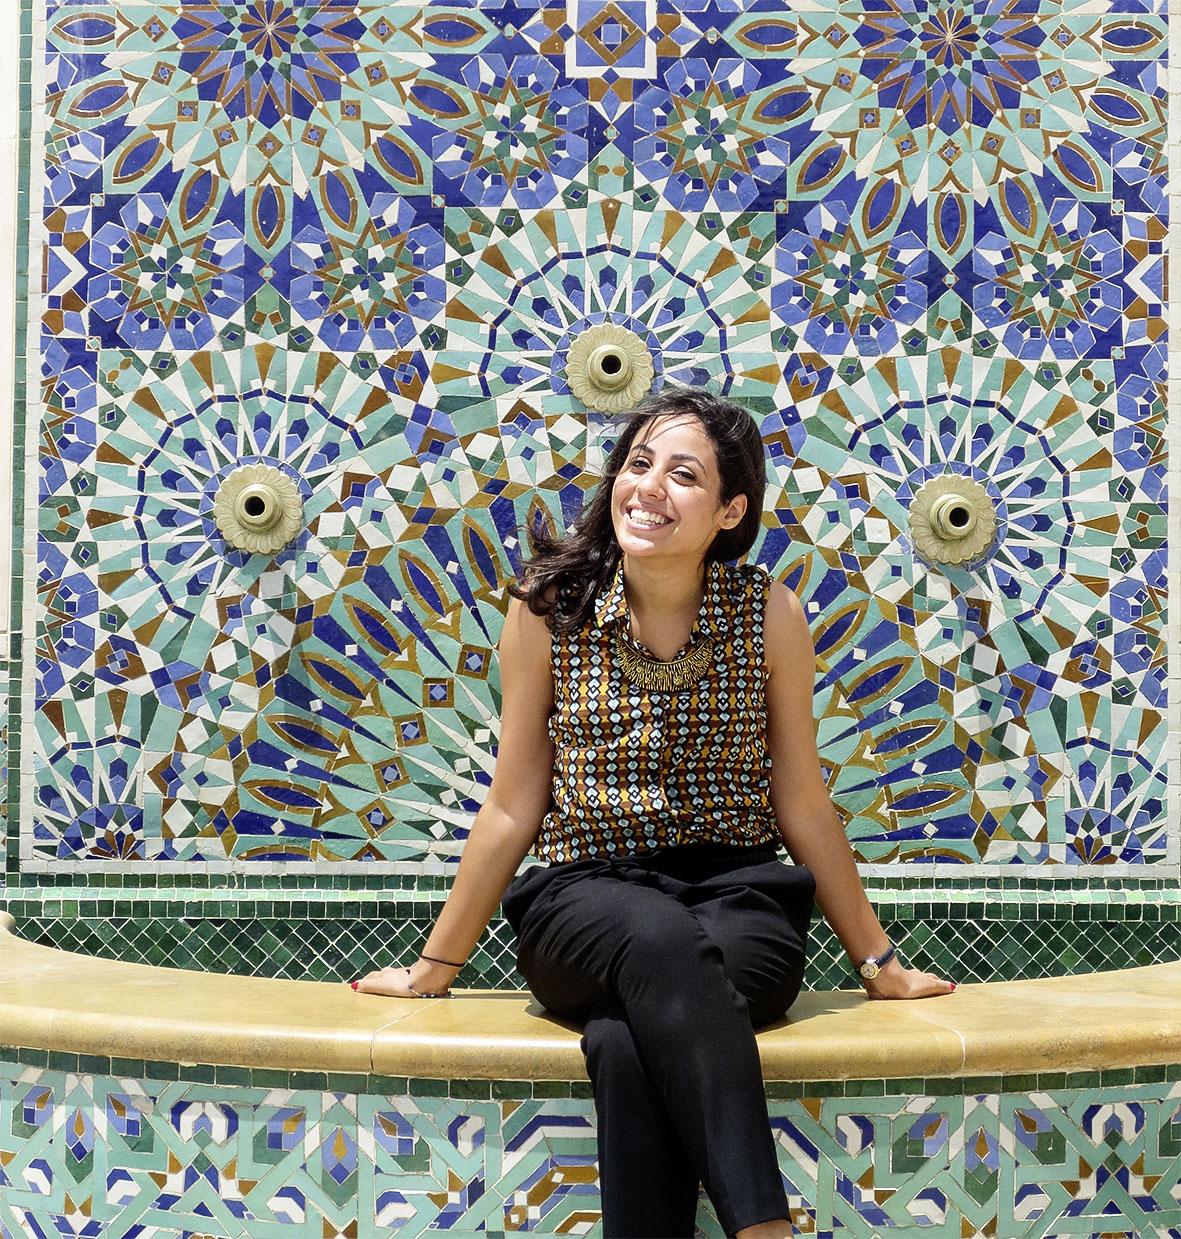 WELTFRAUEN<br>Sarah Zouak